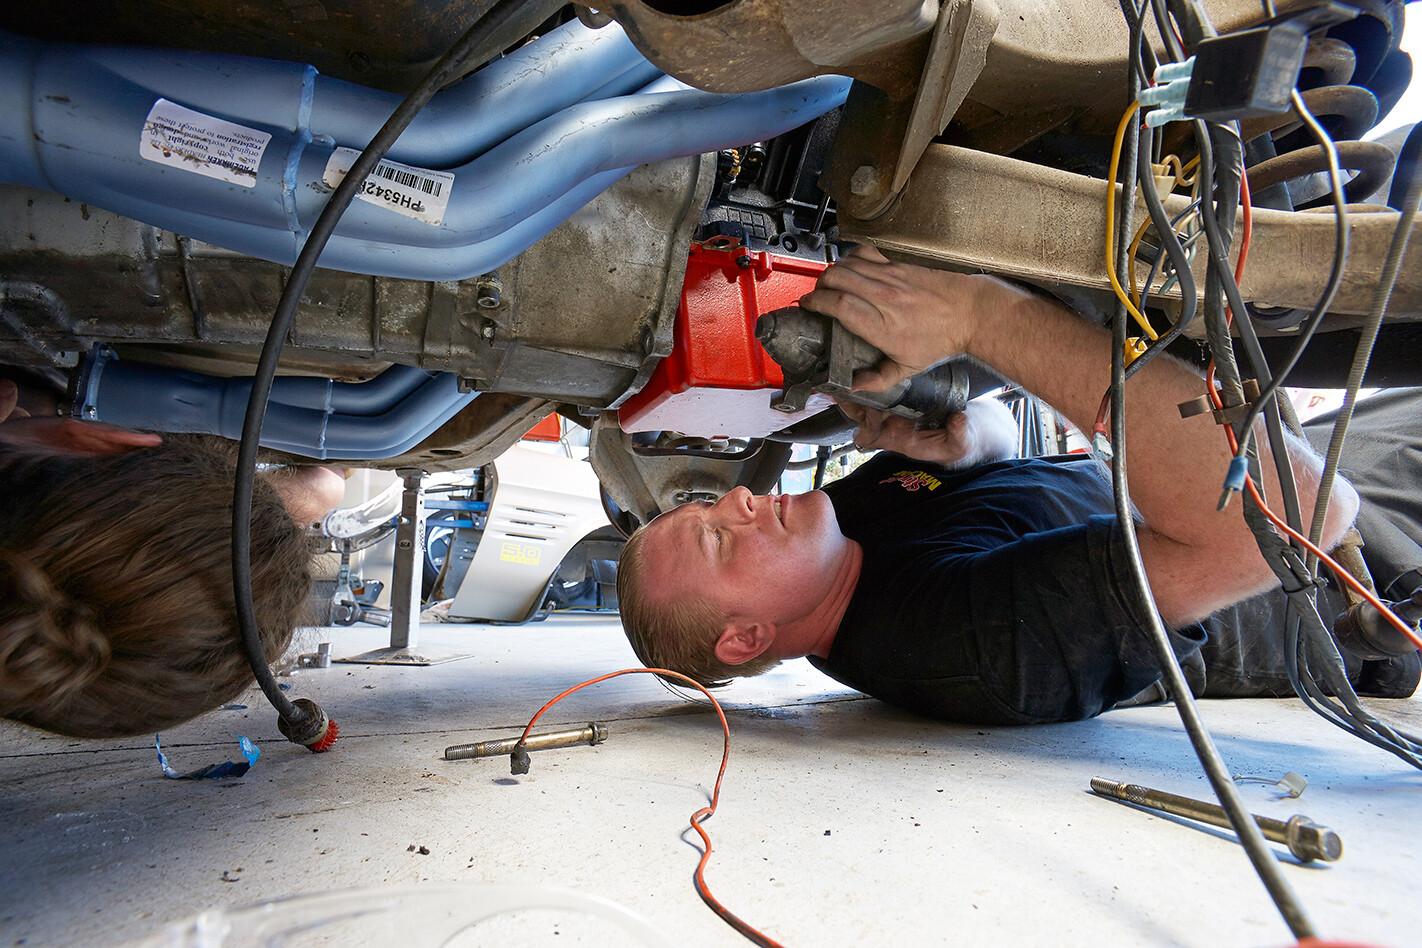 installing the extractors